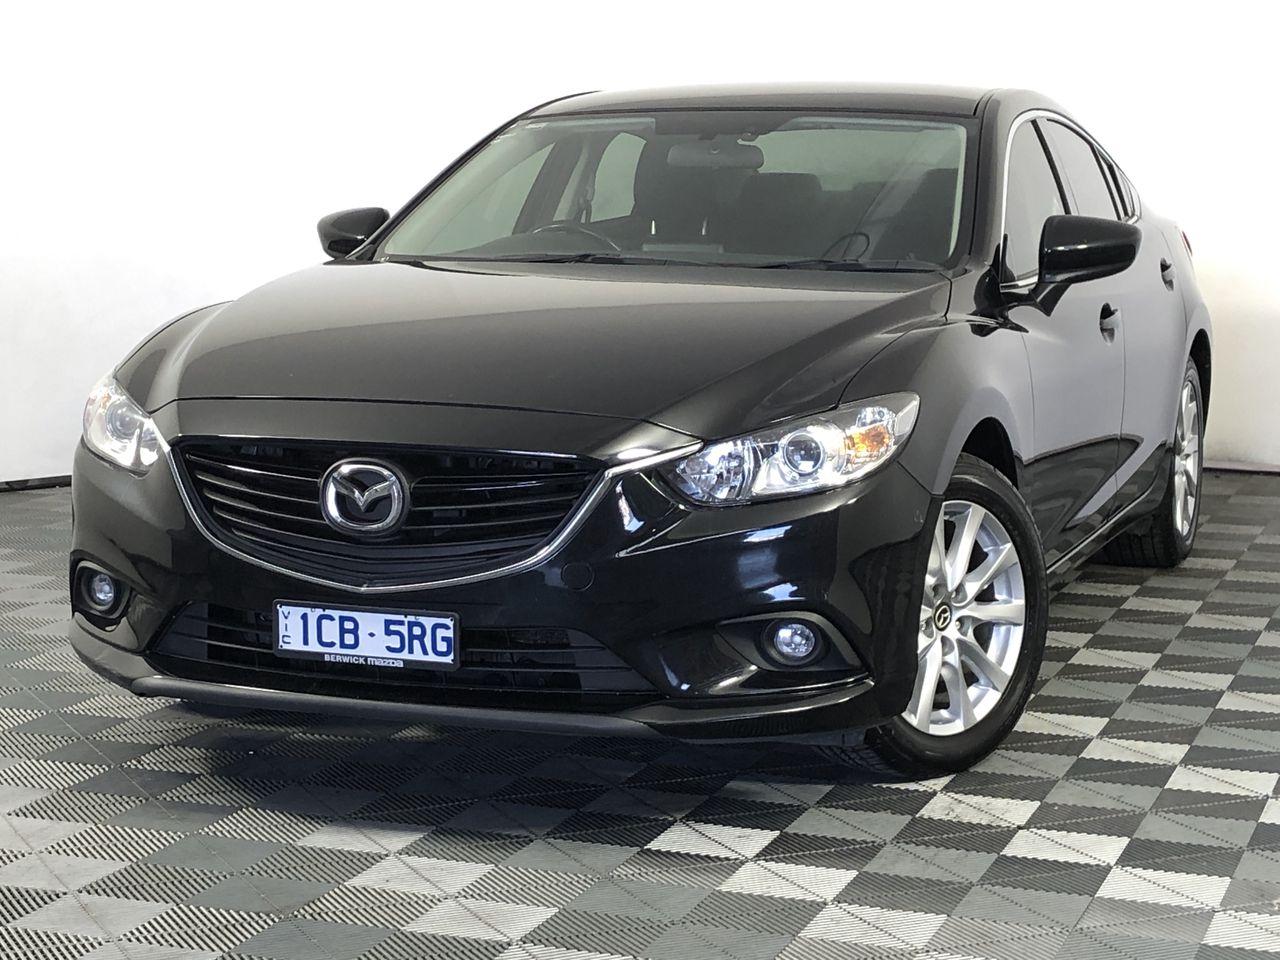 2015 Mazda 6 Sport GJ Automatic Sedan